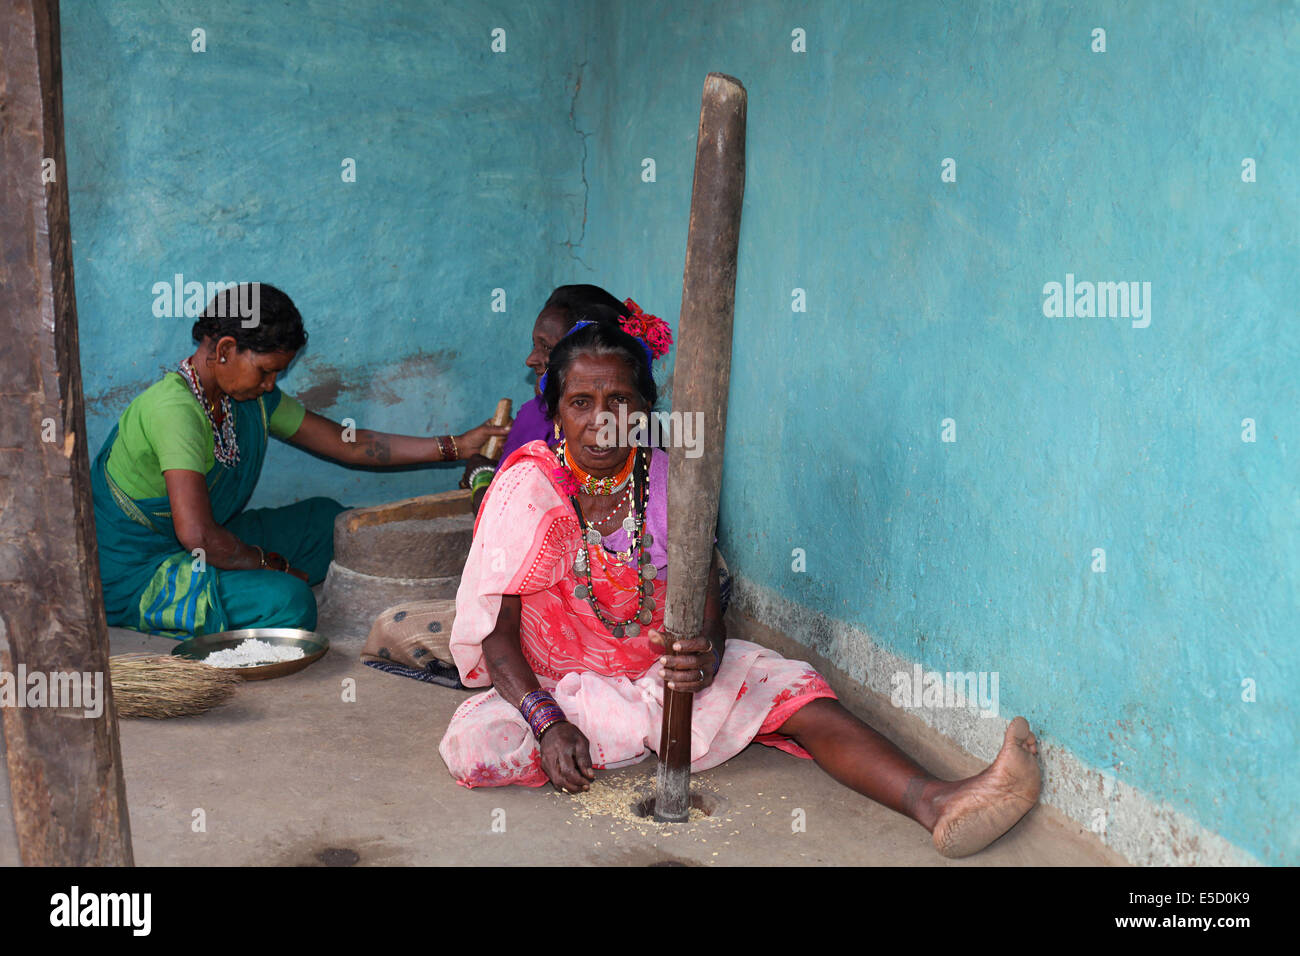 Tribal women pounding rice, Baiga tribe. Karangra Village, Chattisgadh, India - Stock Image